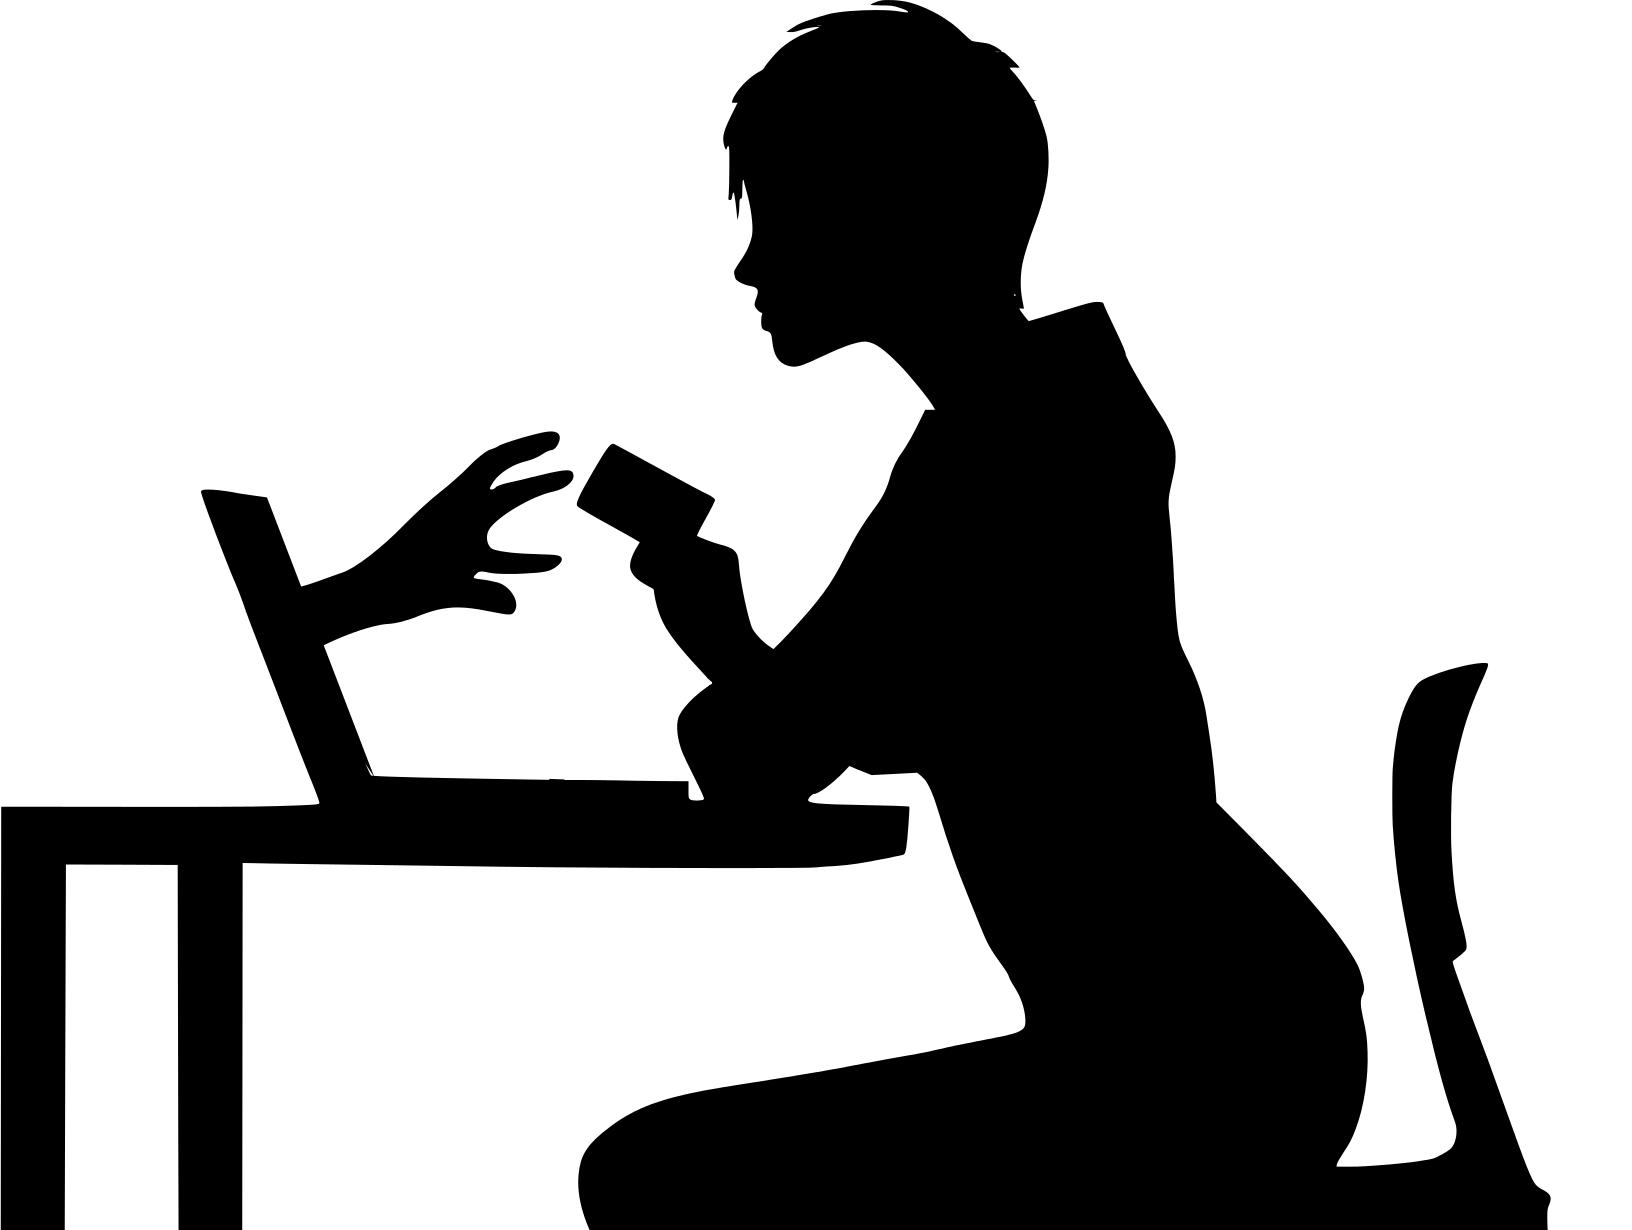 Is Redberyy a Scam or Untrustworthy Online Store?